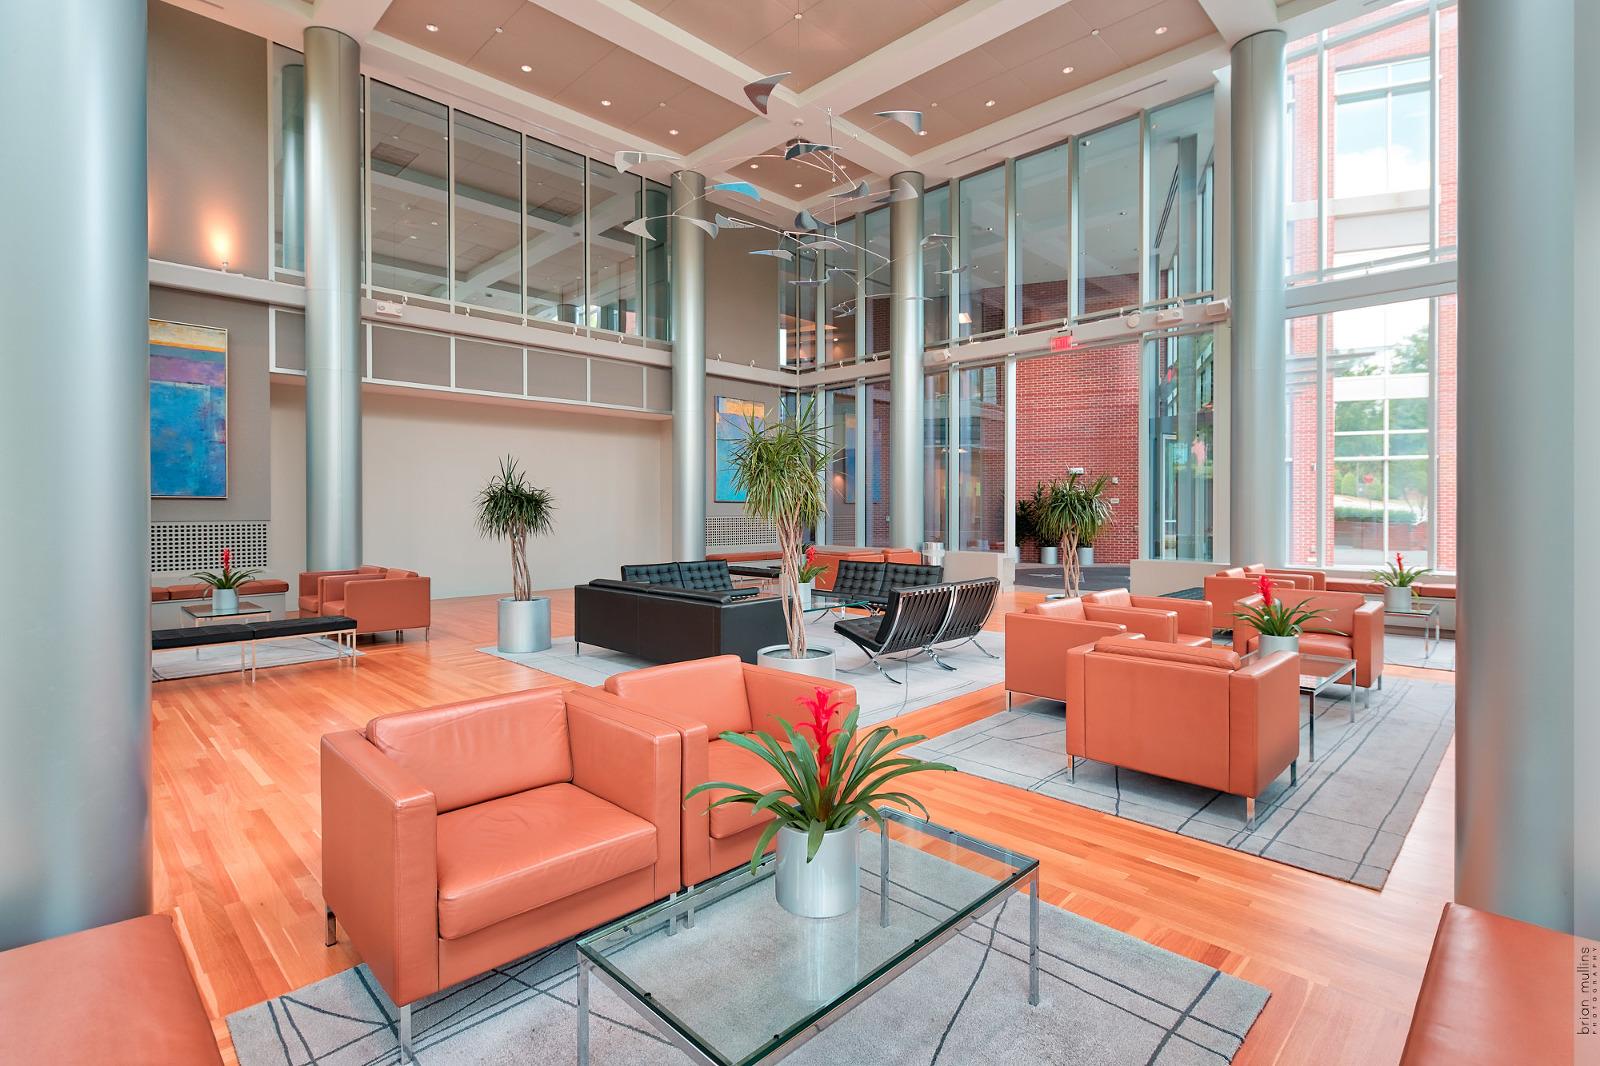 centennial campus commercial architecture